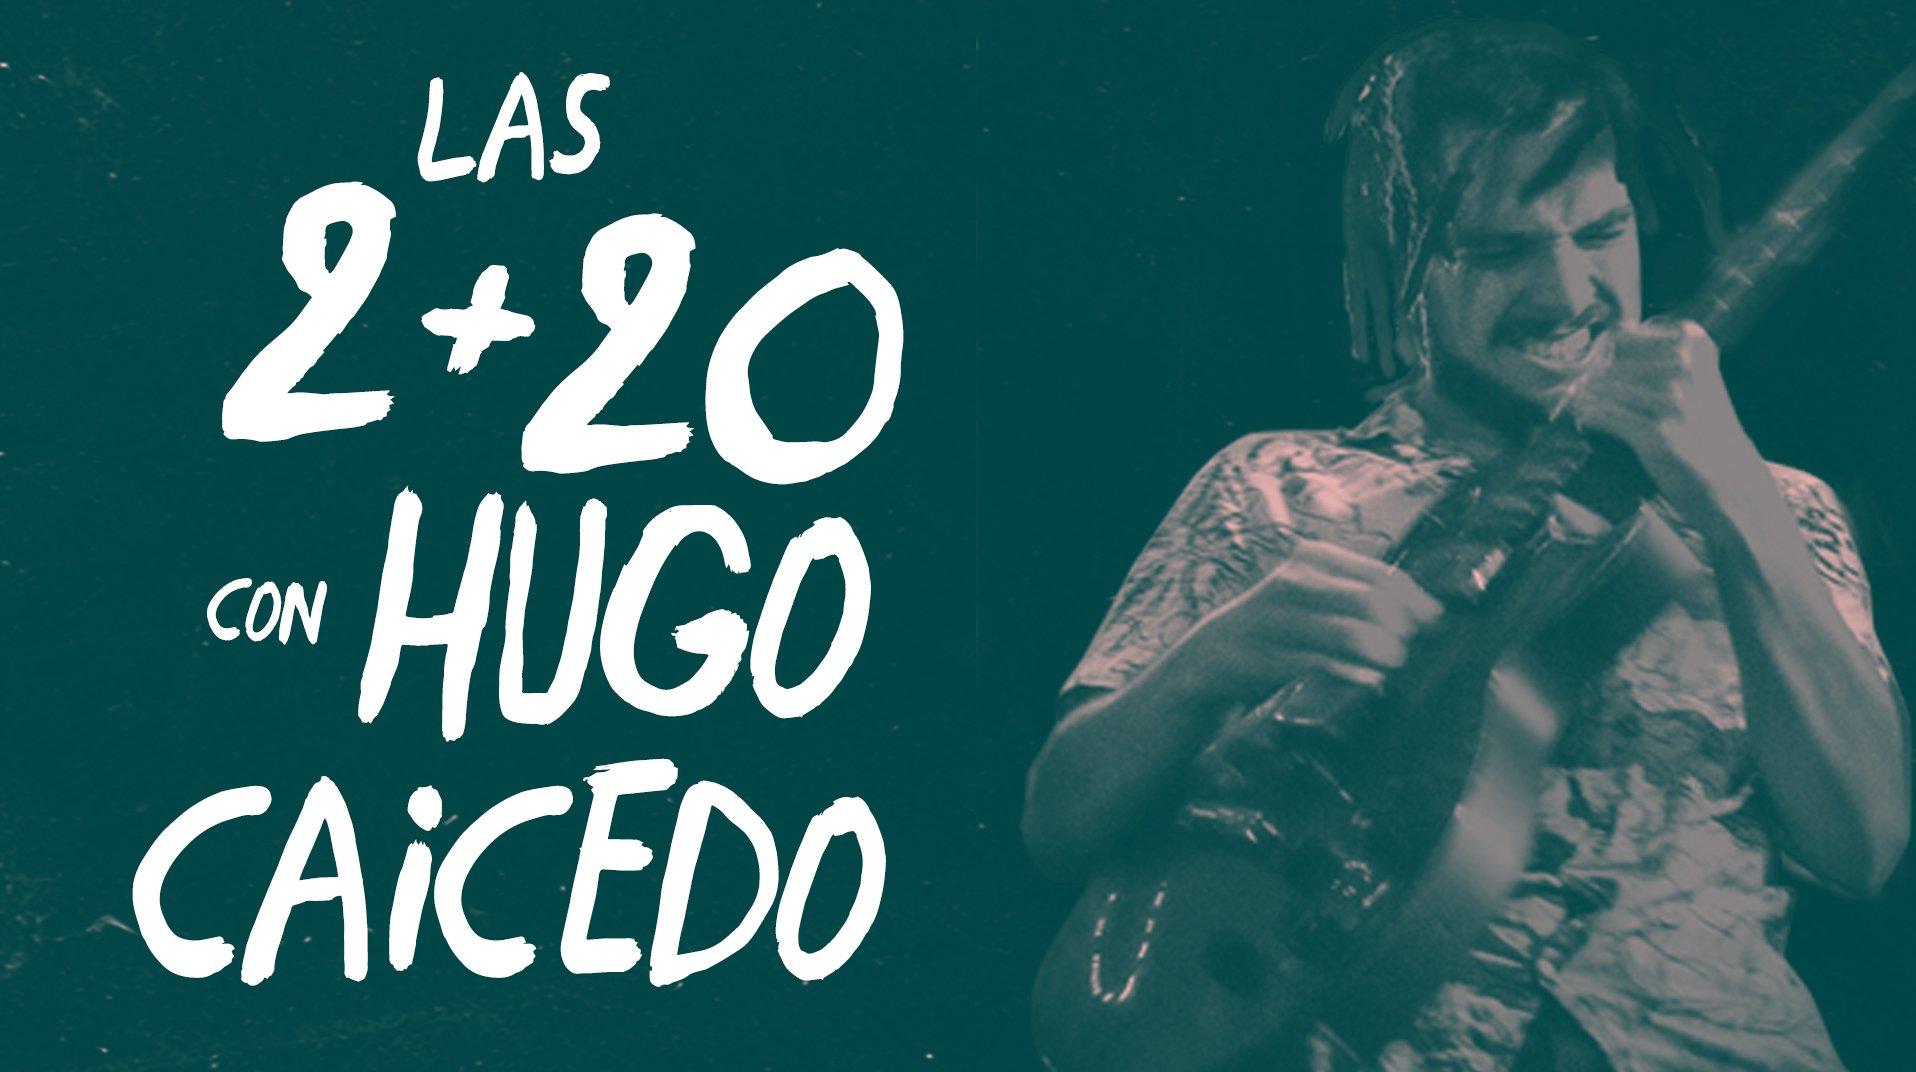 2 + 20 Hugo articulo